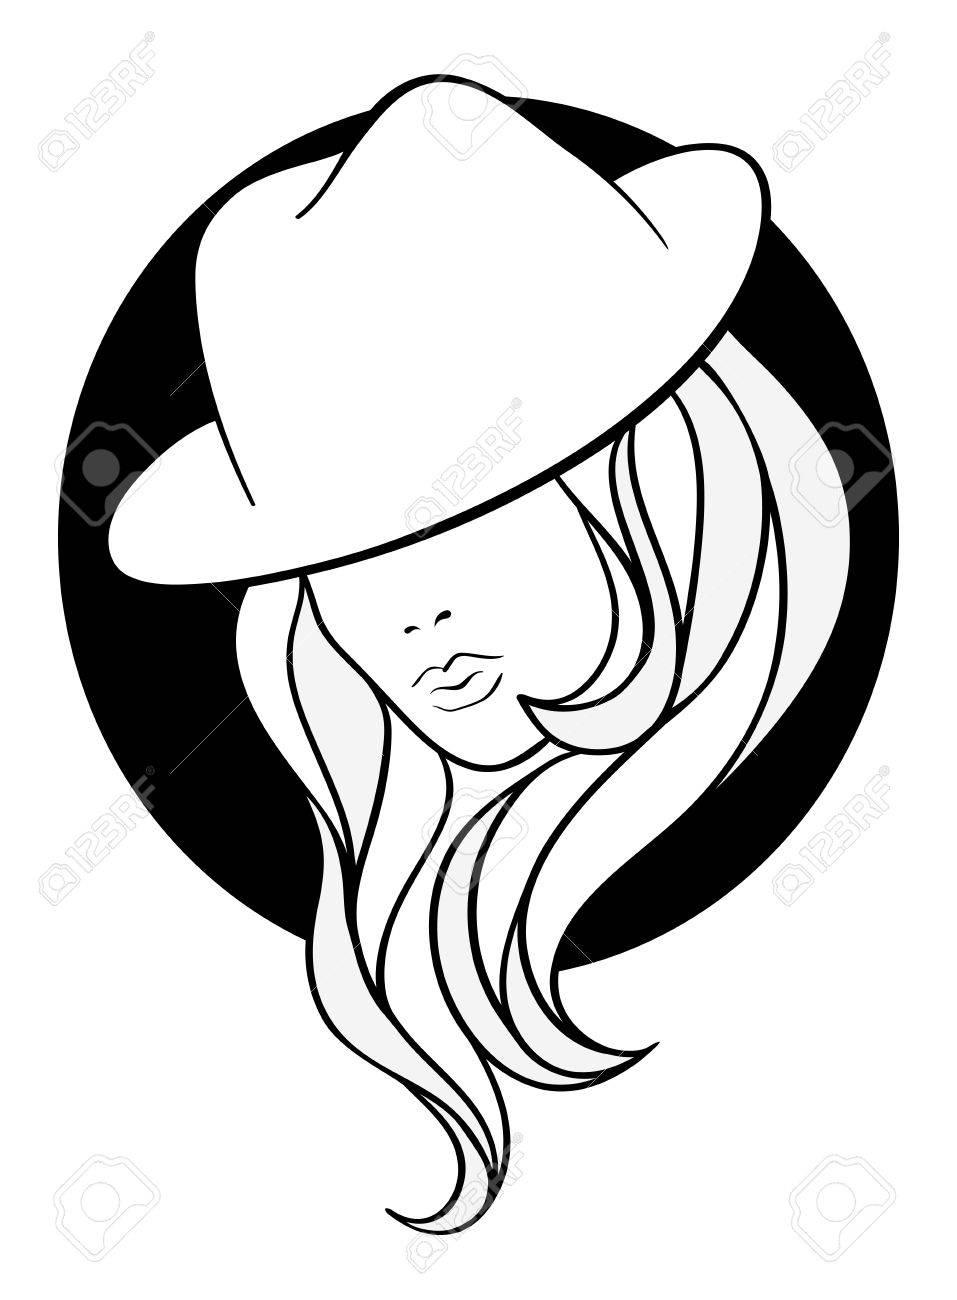 Chica joven en un sombrero de gángster de la vendimia en fondo negro ronda.  Línea e7cc34e4dba